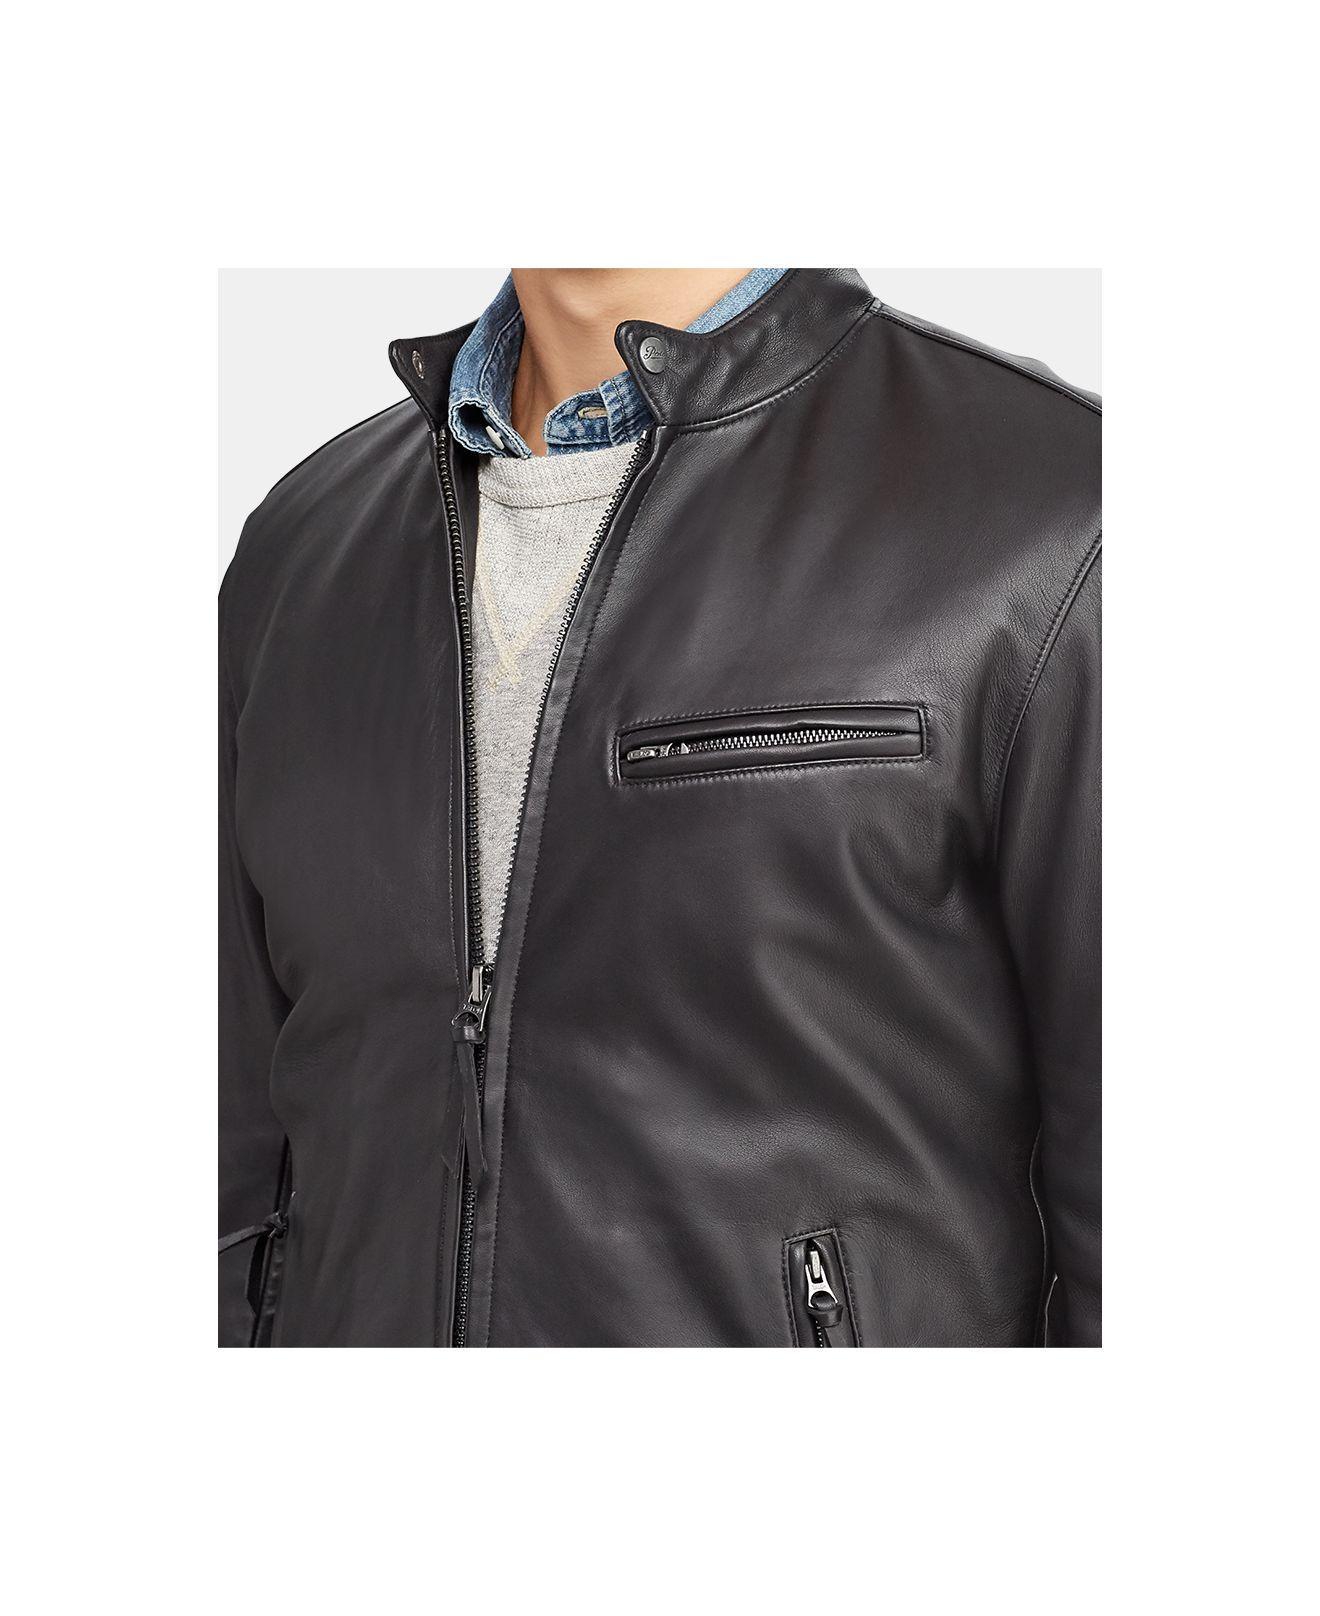 291b2bb3d13f Lyst - Polo Ralph Lauren Men s Cafe Racer Leather Jacket for Men